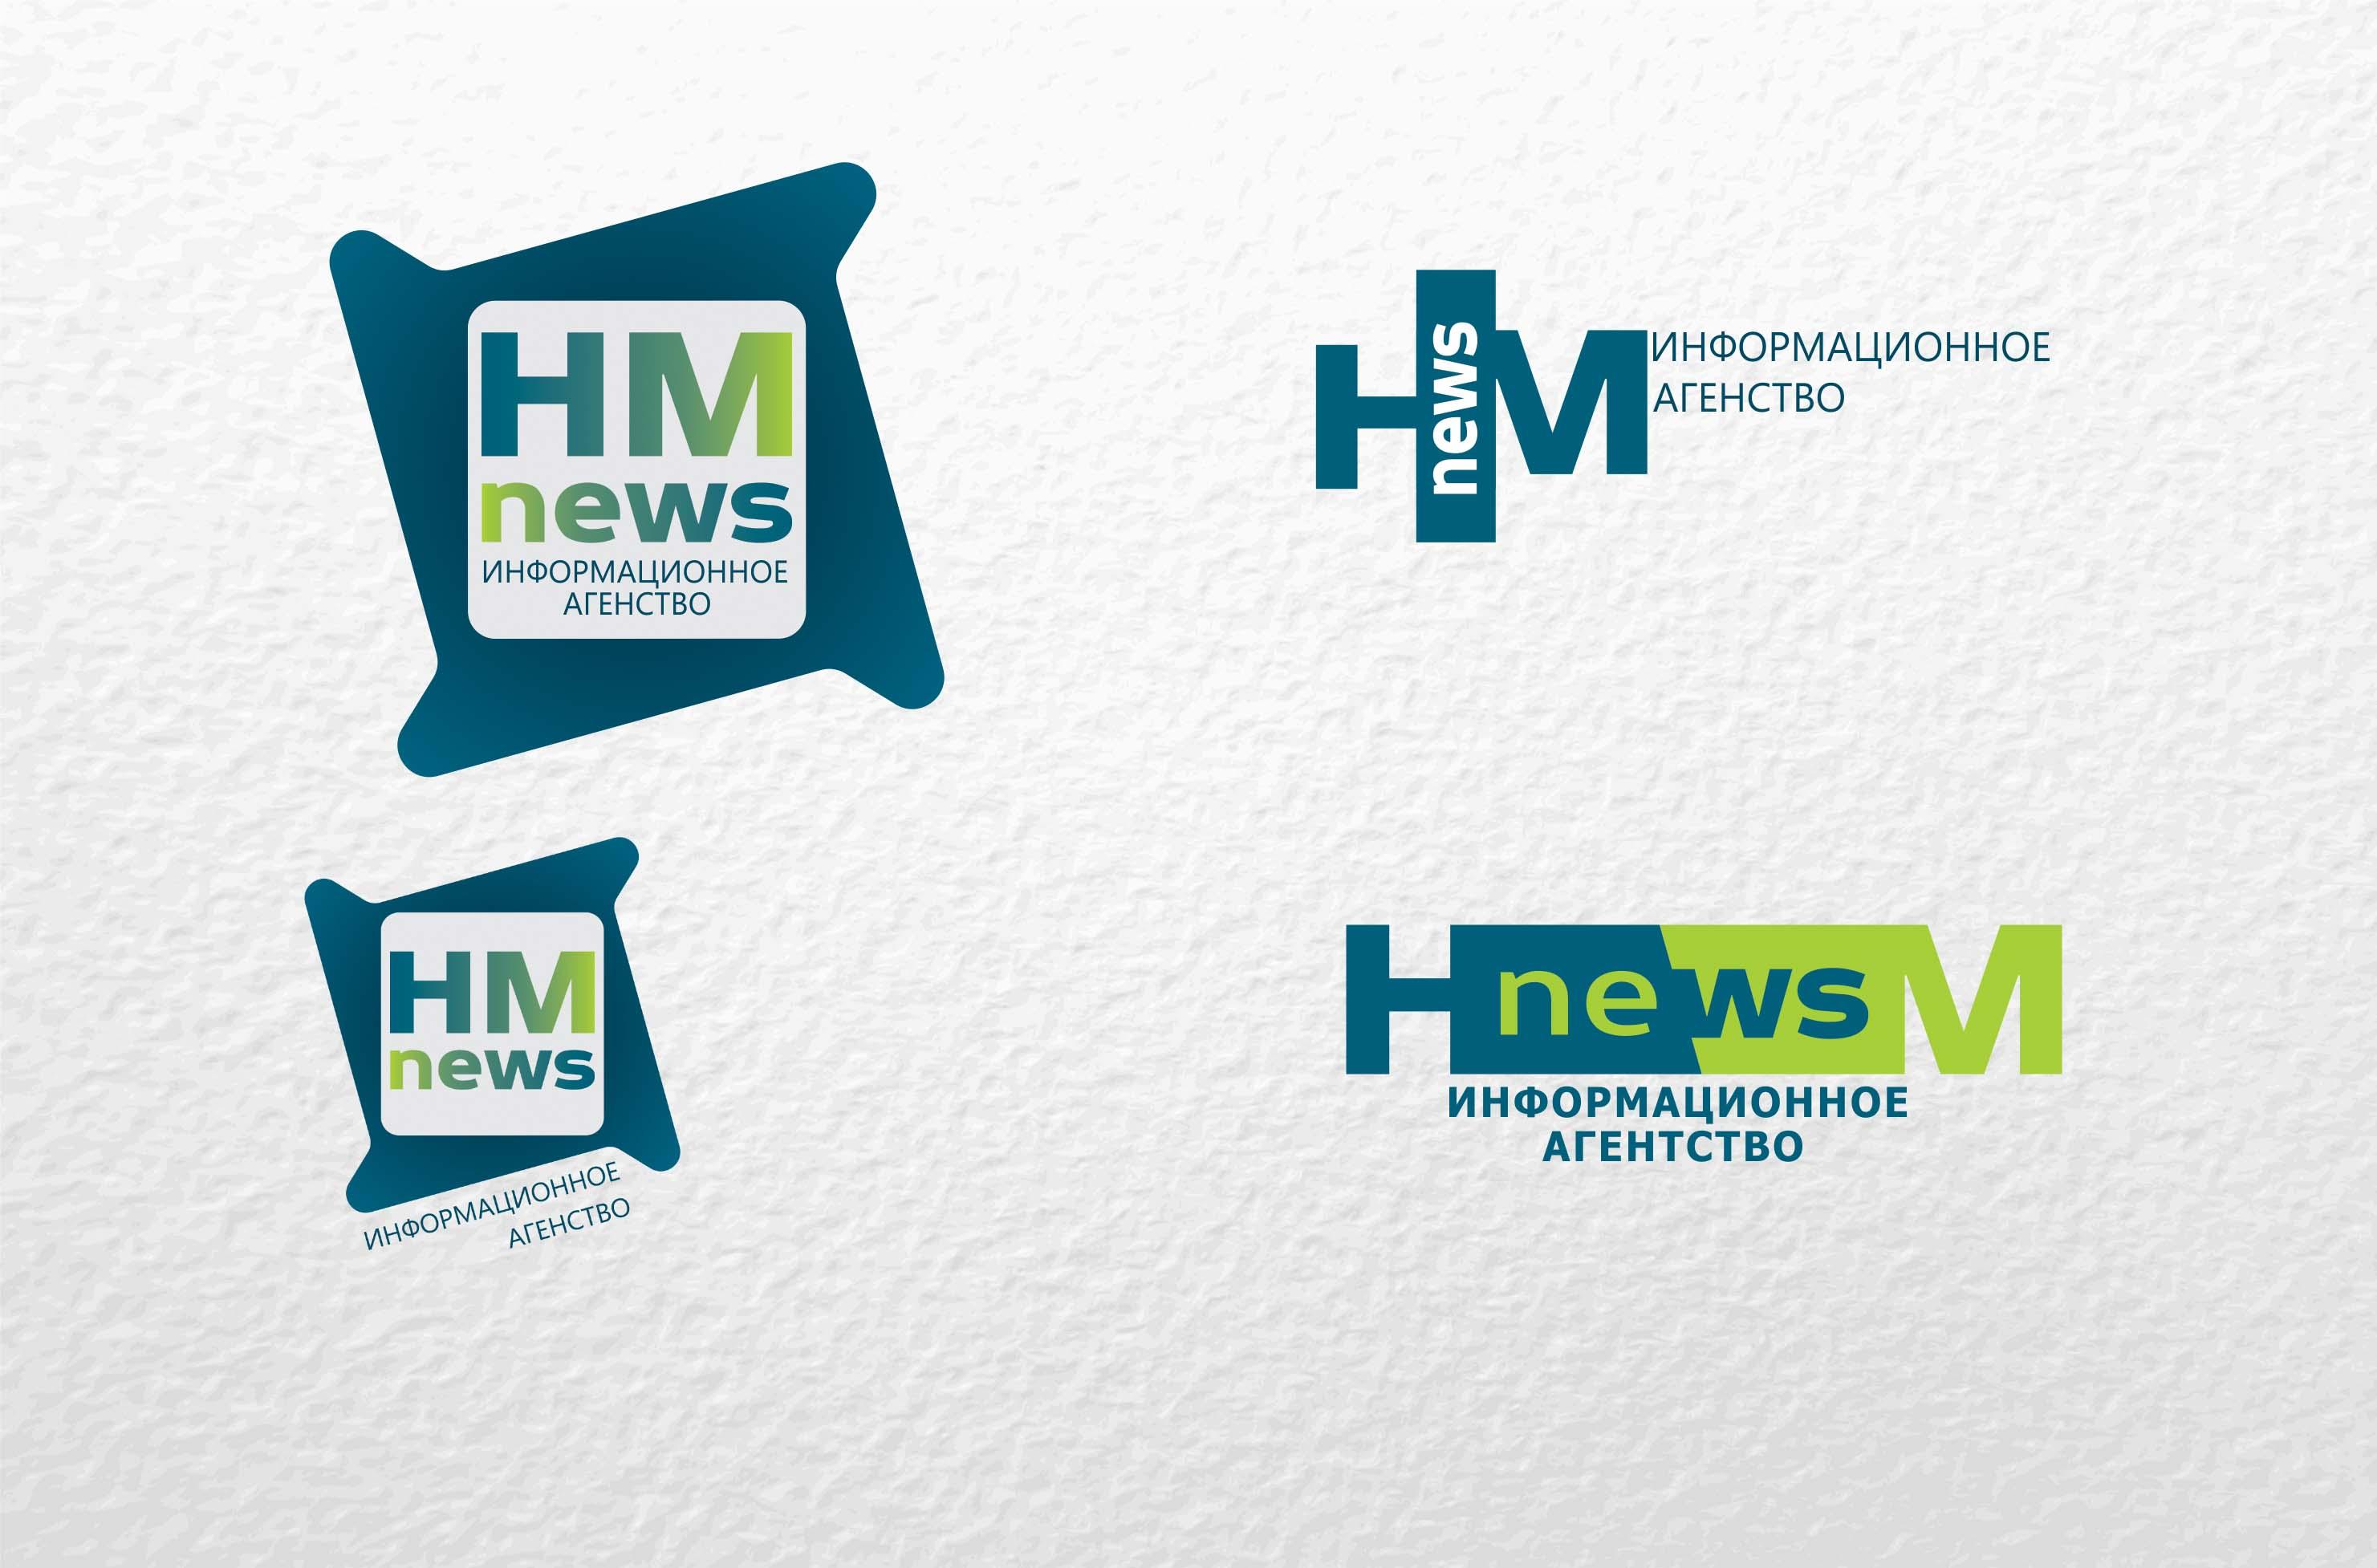 Логотип для информационного агентства фото f_7205aa83d5b4643d.jpg